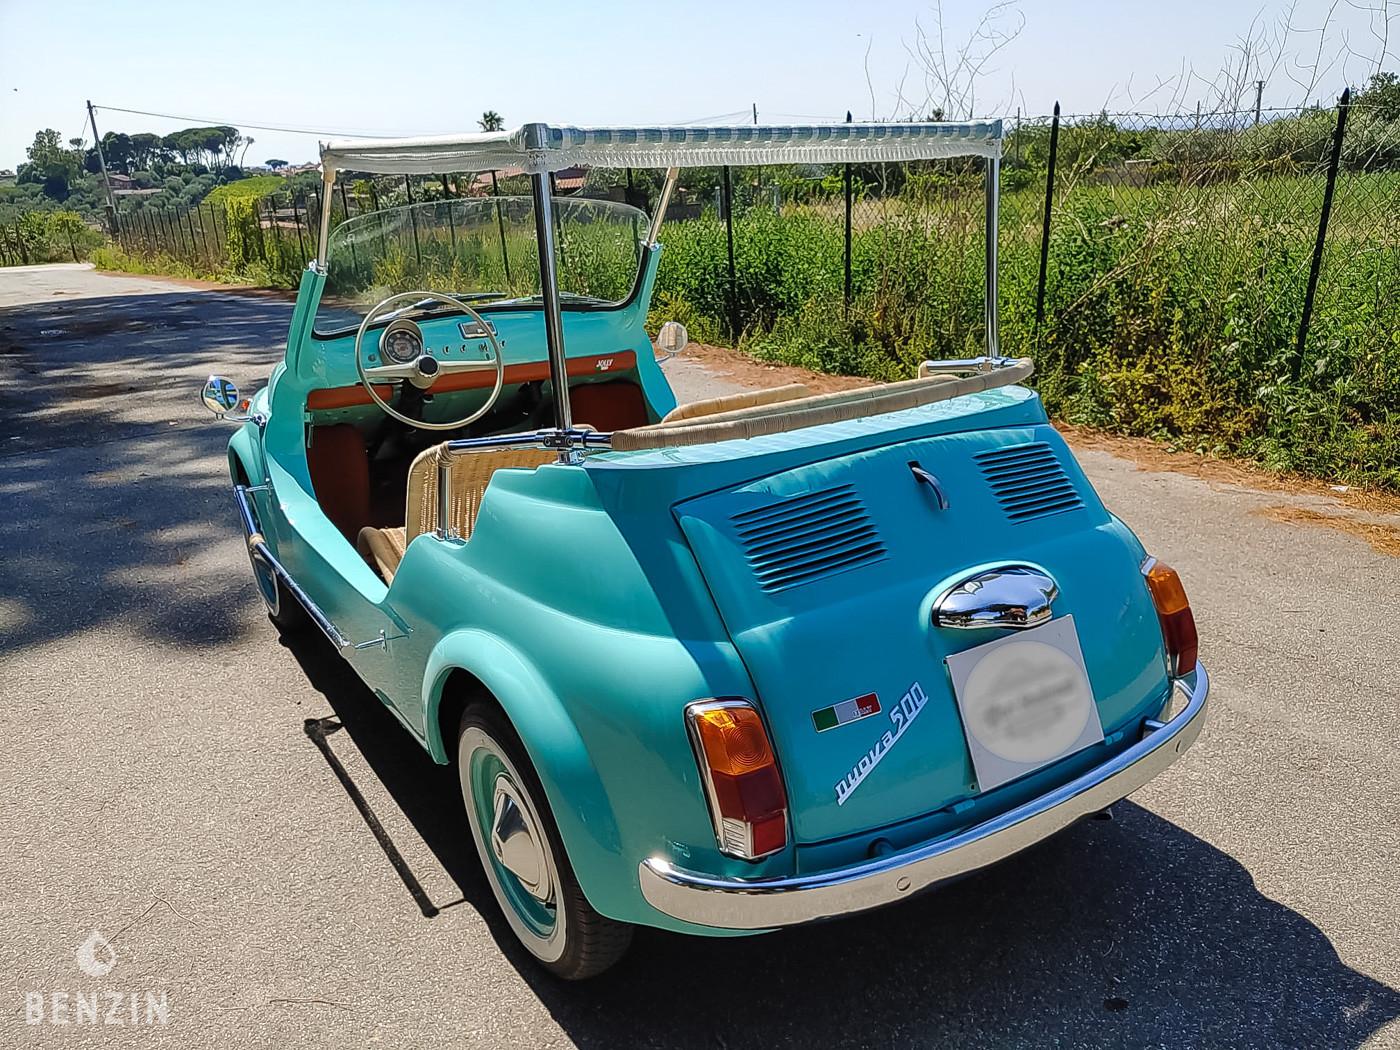 Fiat Jolly Spiaggina a vendre/ Fiat Jolly Spiaggina to sell/ Fiat Jolly Spiaginna verkaufen/ Fiat Jolly Spiaginna en venta